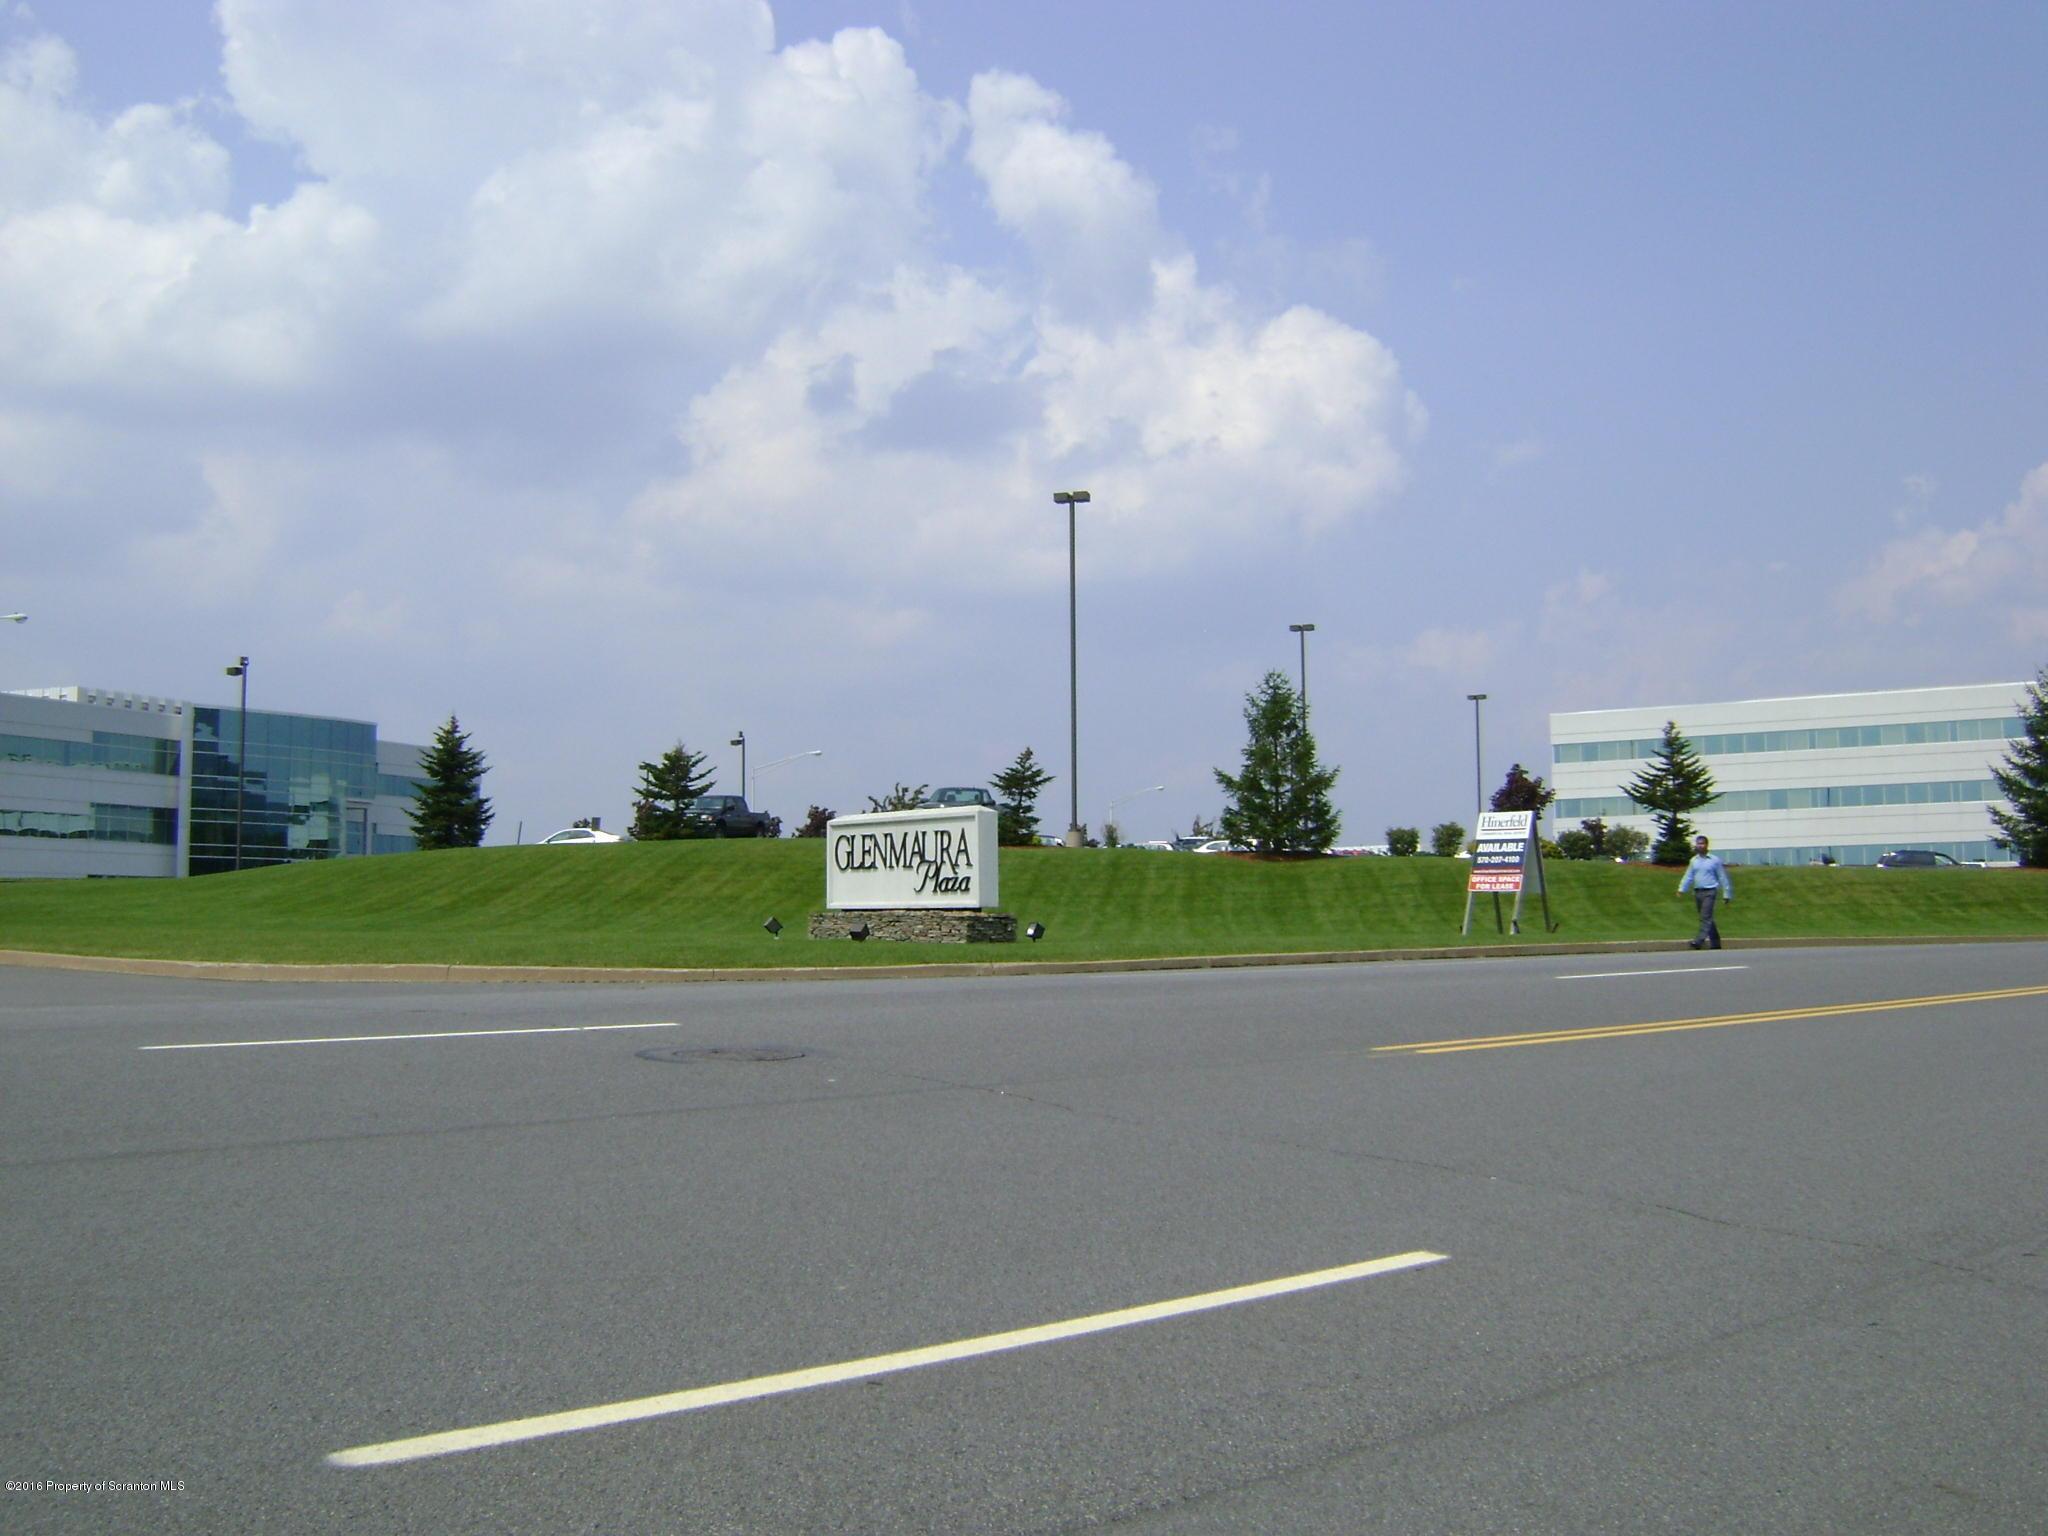 52 Glenmaura National Blvd, Moosic, Pennsylvania 18507, ,6 BathroomsBathrooms,Commercial,For Lease,Glenmaura National,21-1539